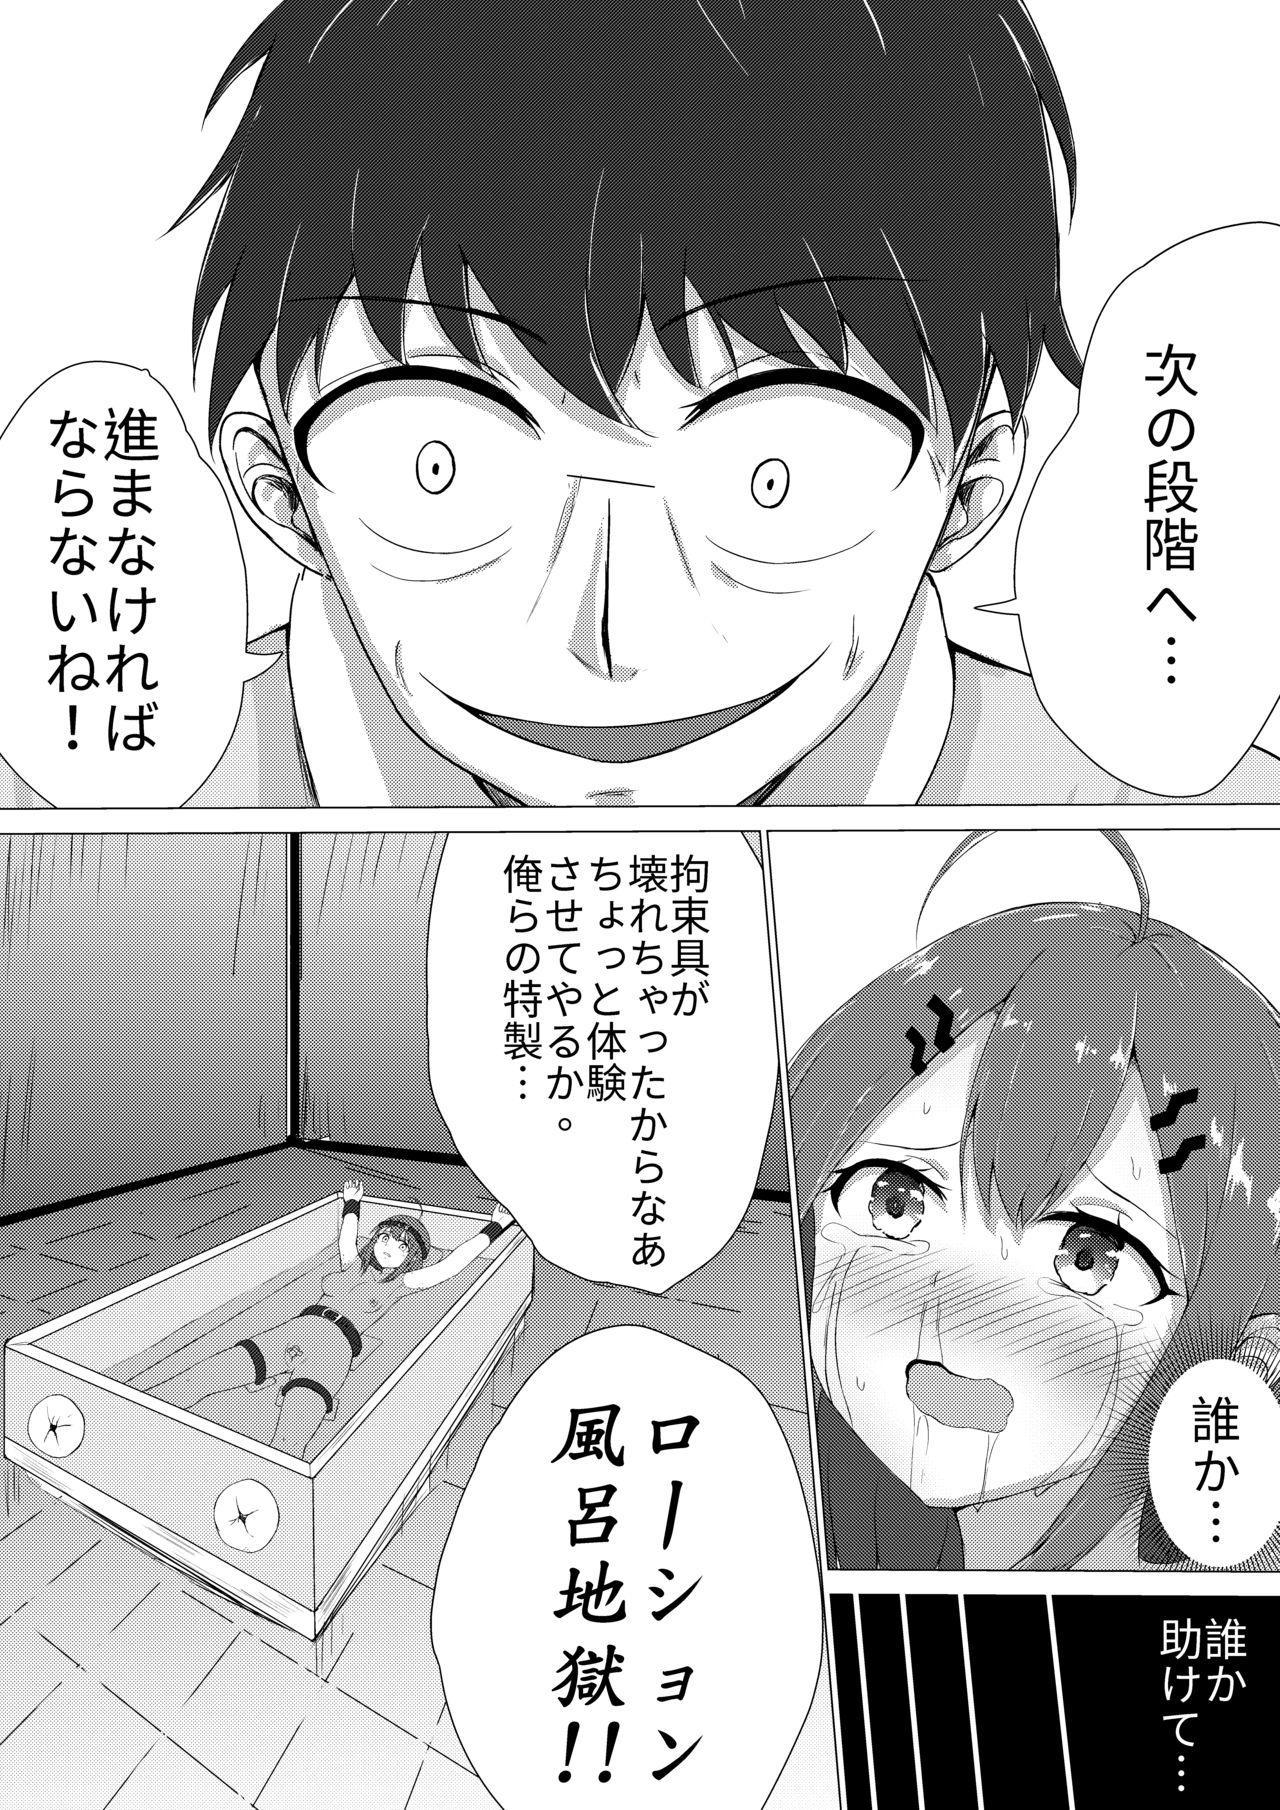 Kusuguri Joyo Oshioki 24